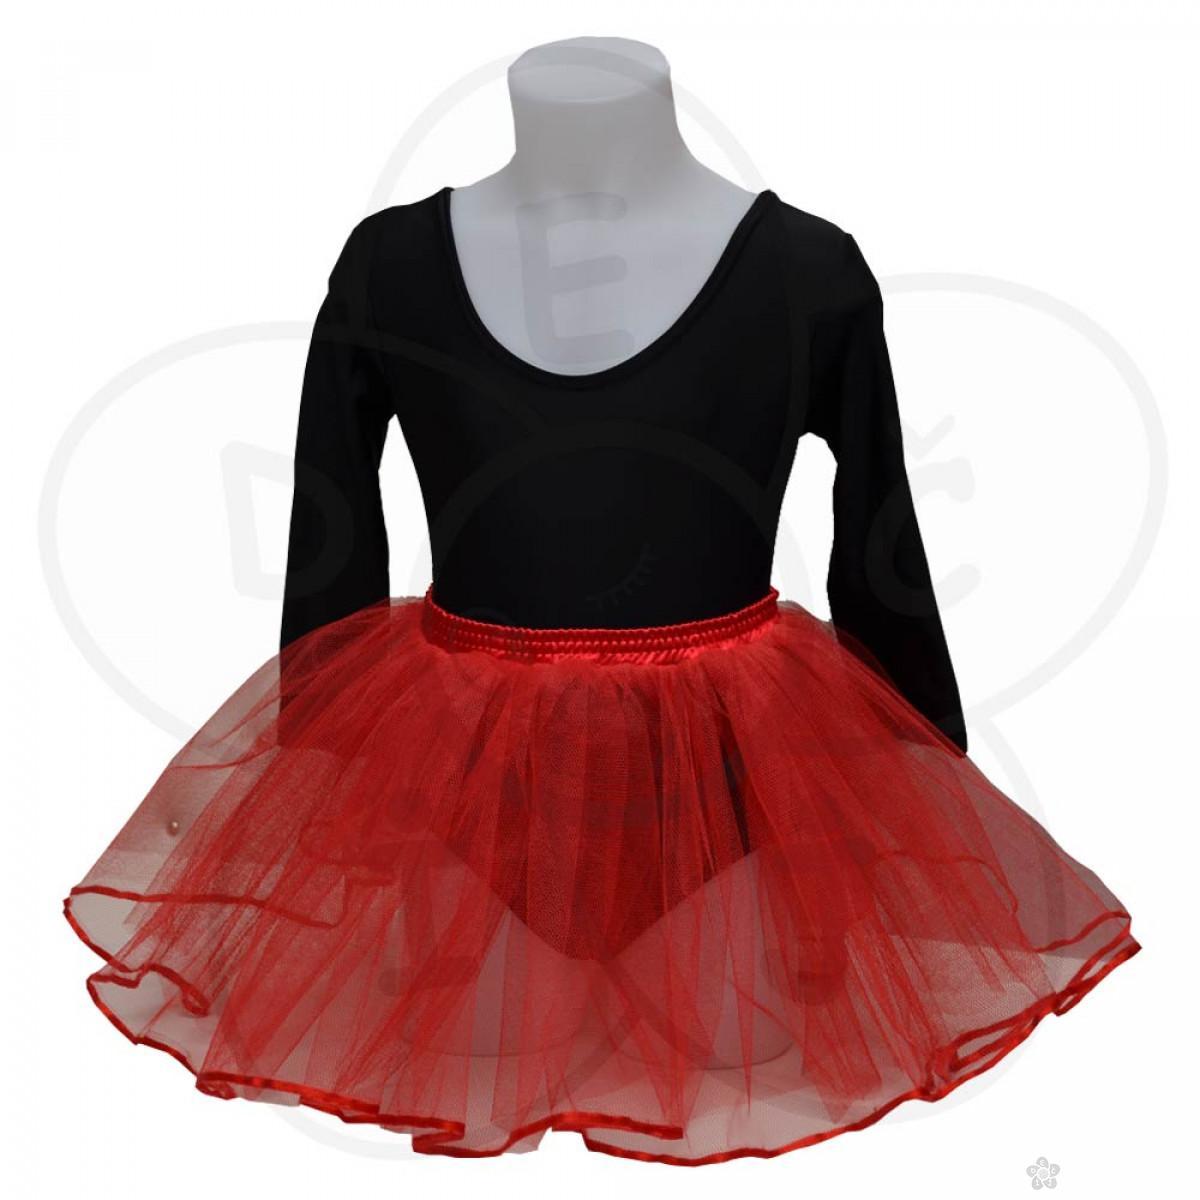 Baletska suknjica, crvena